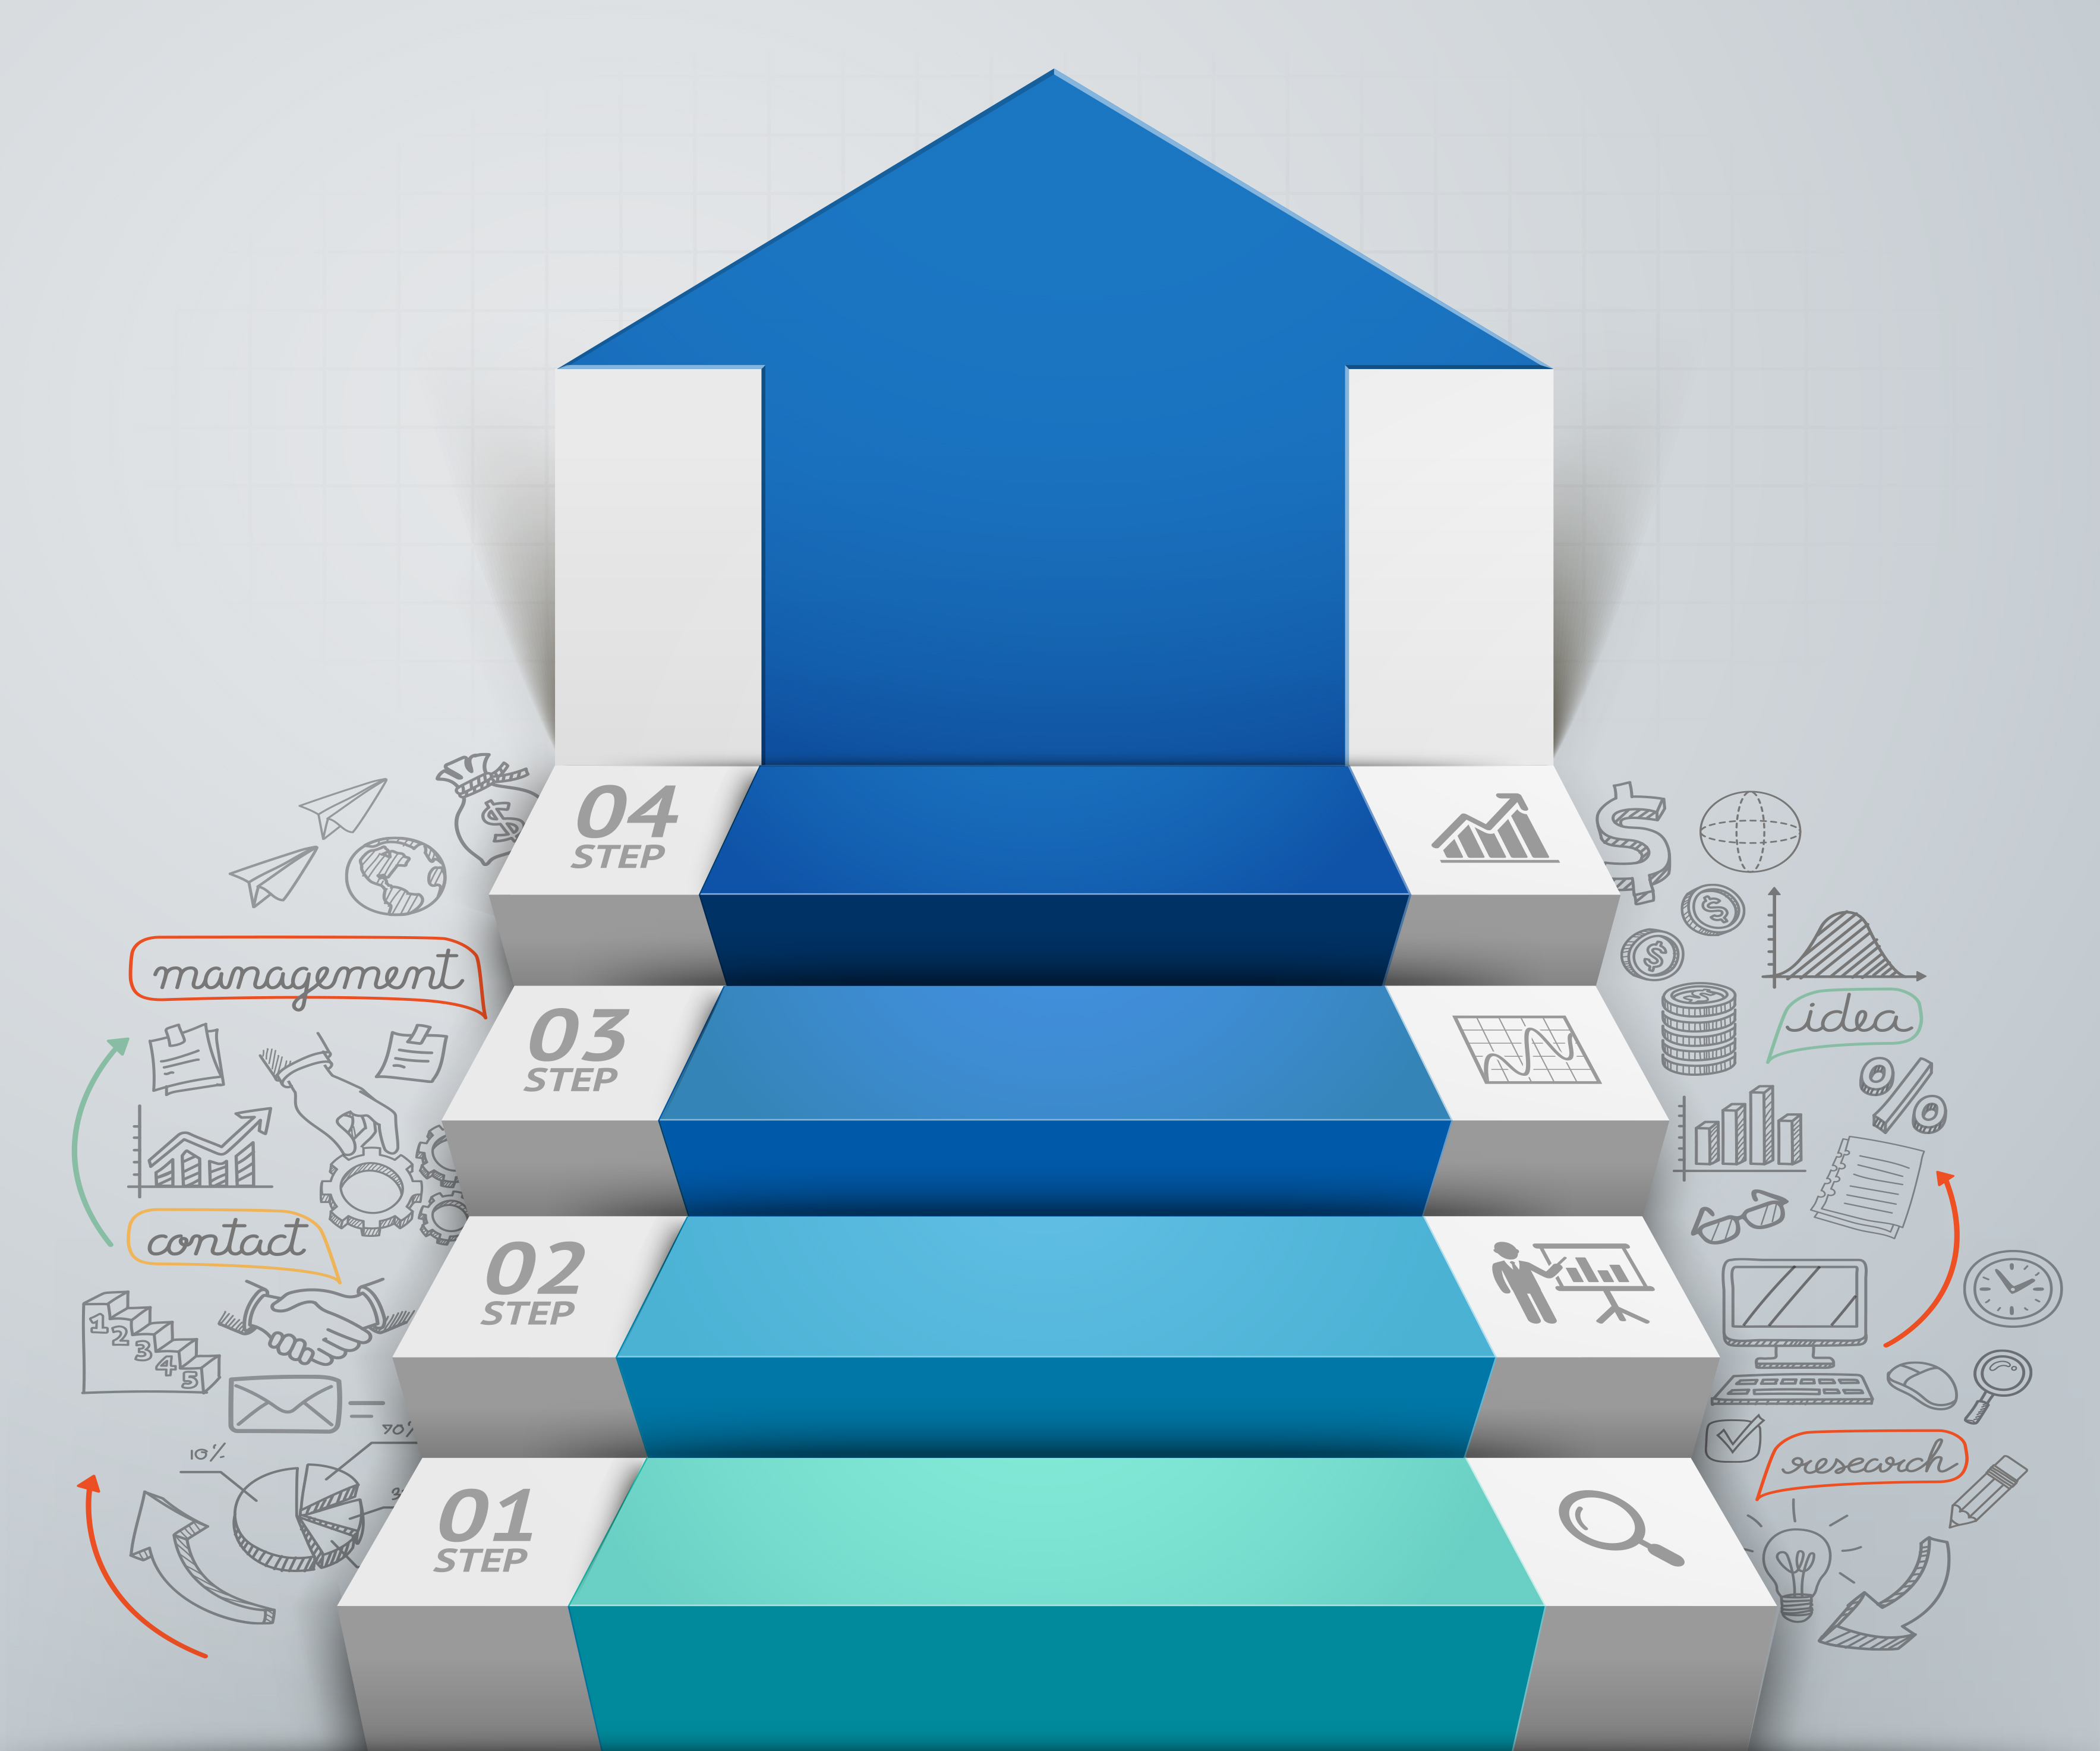 ic u00f4ne les ic u00f4nes business site web contexte s u00e9rie bouton